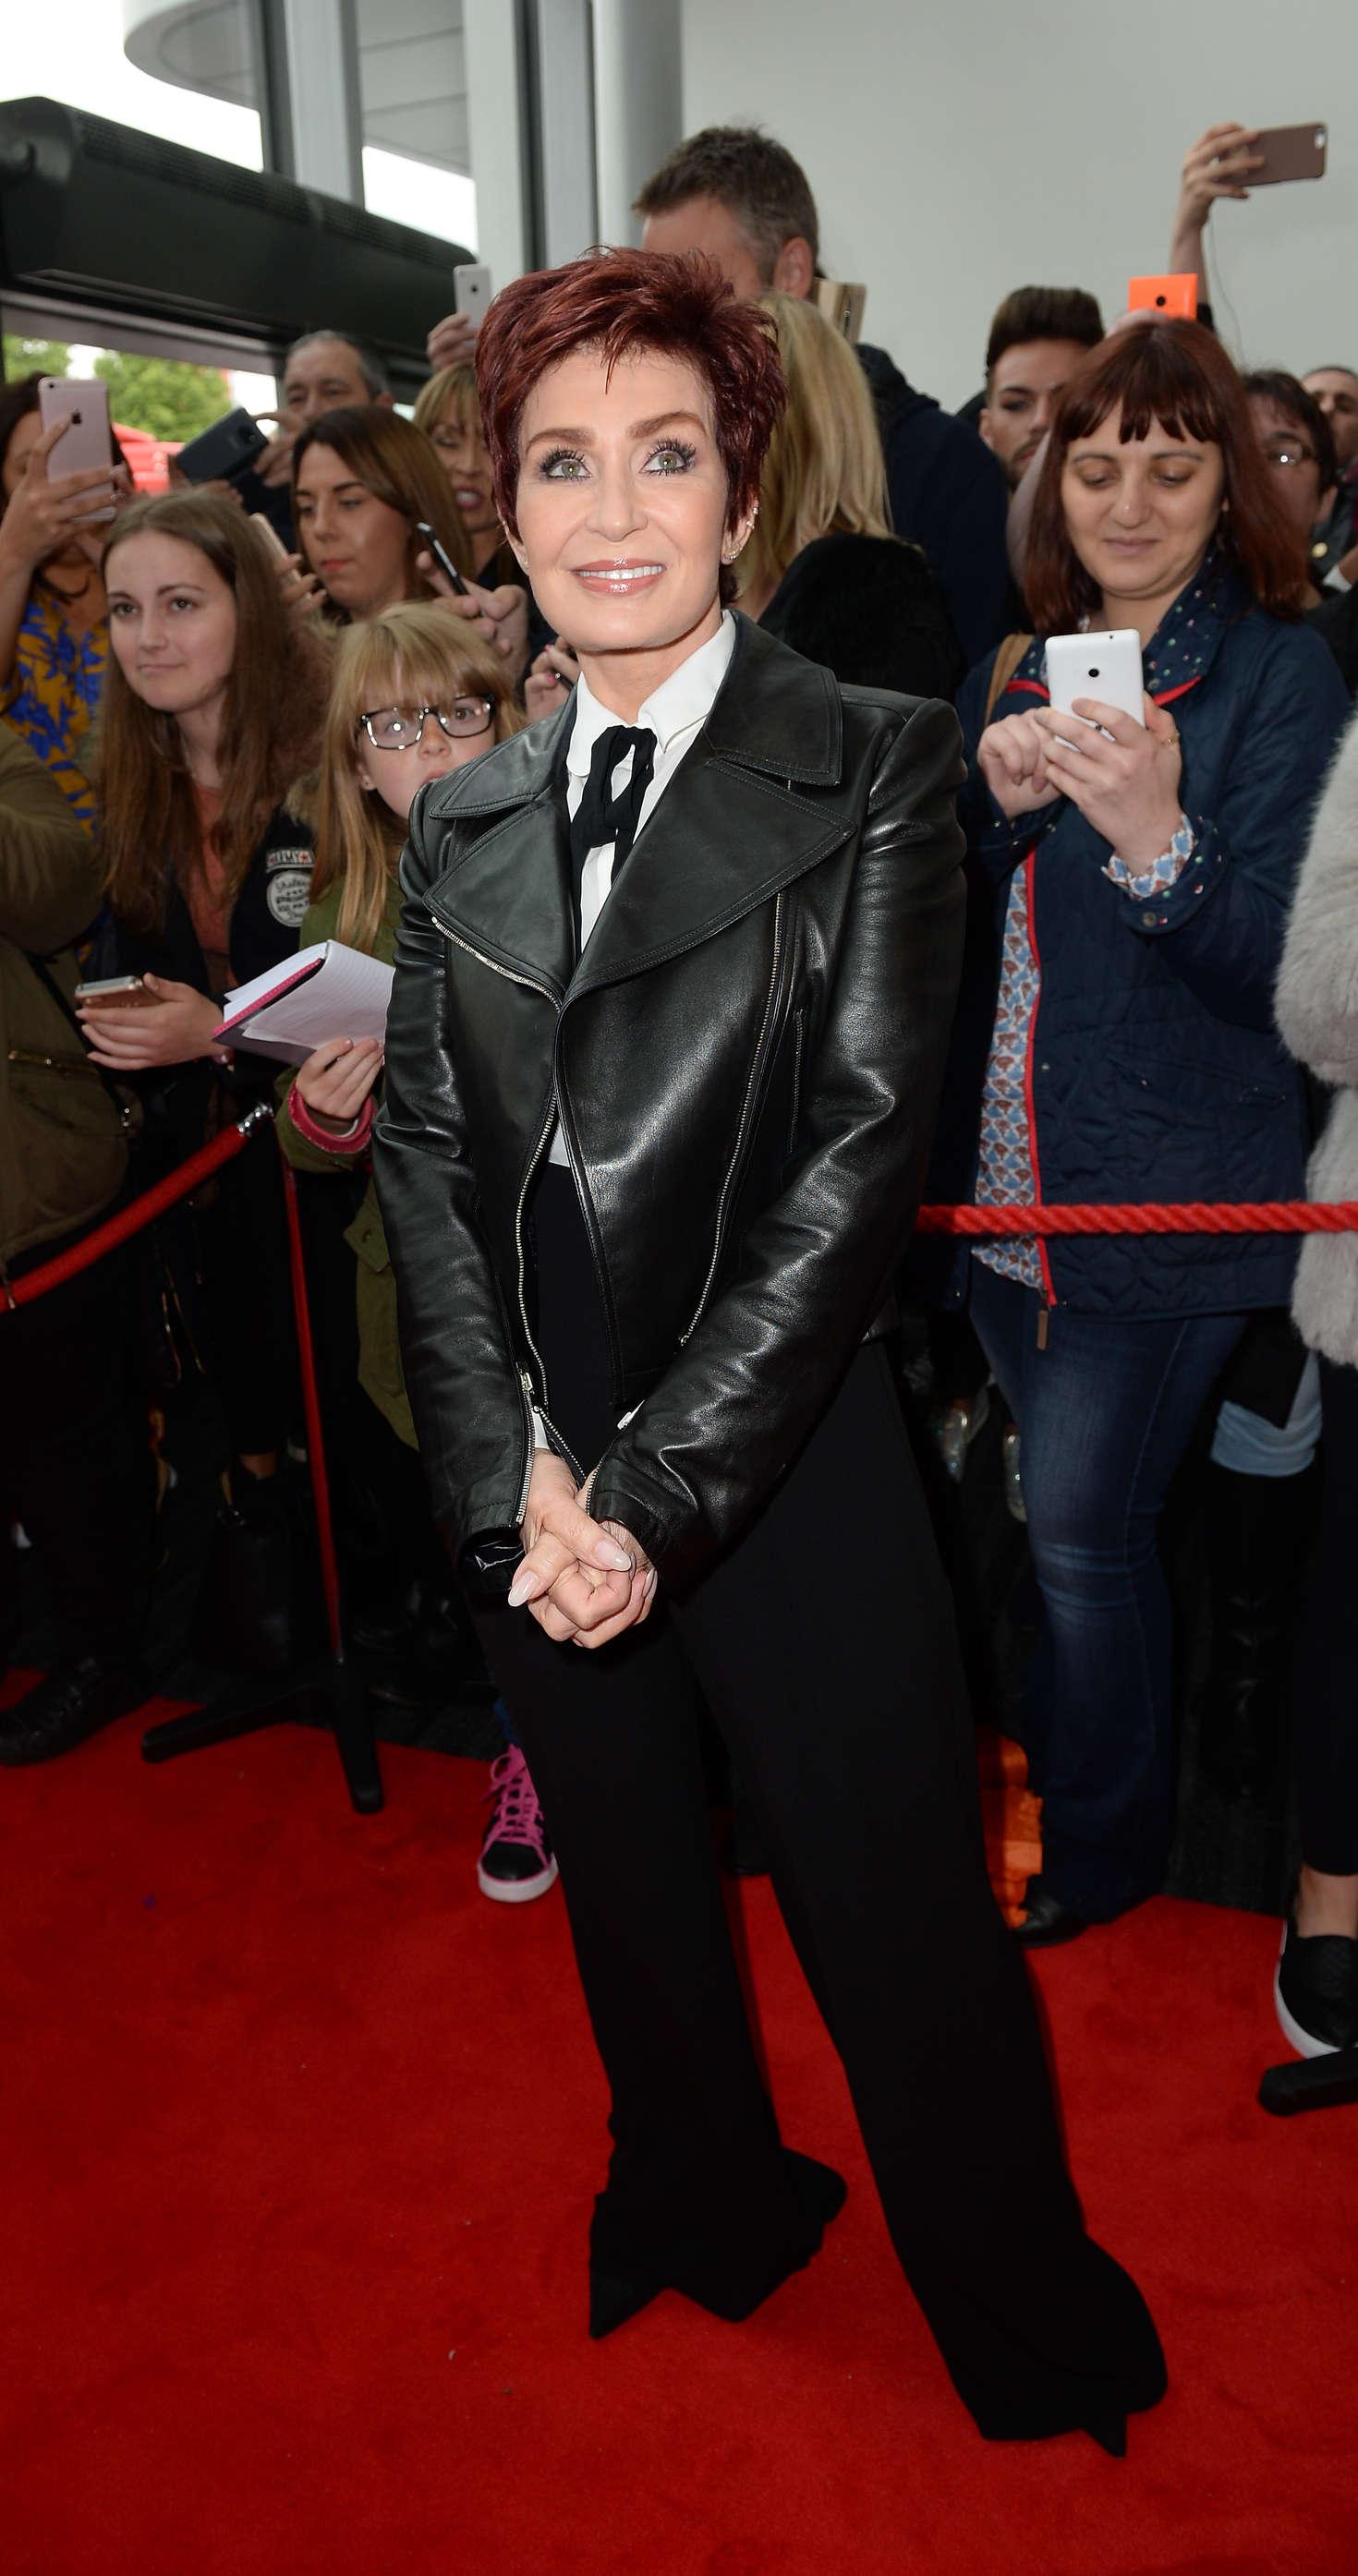 Sharon Osbourne - Arrives for X Factor in Manchester